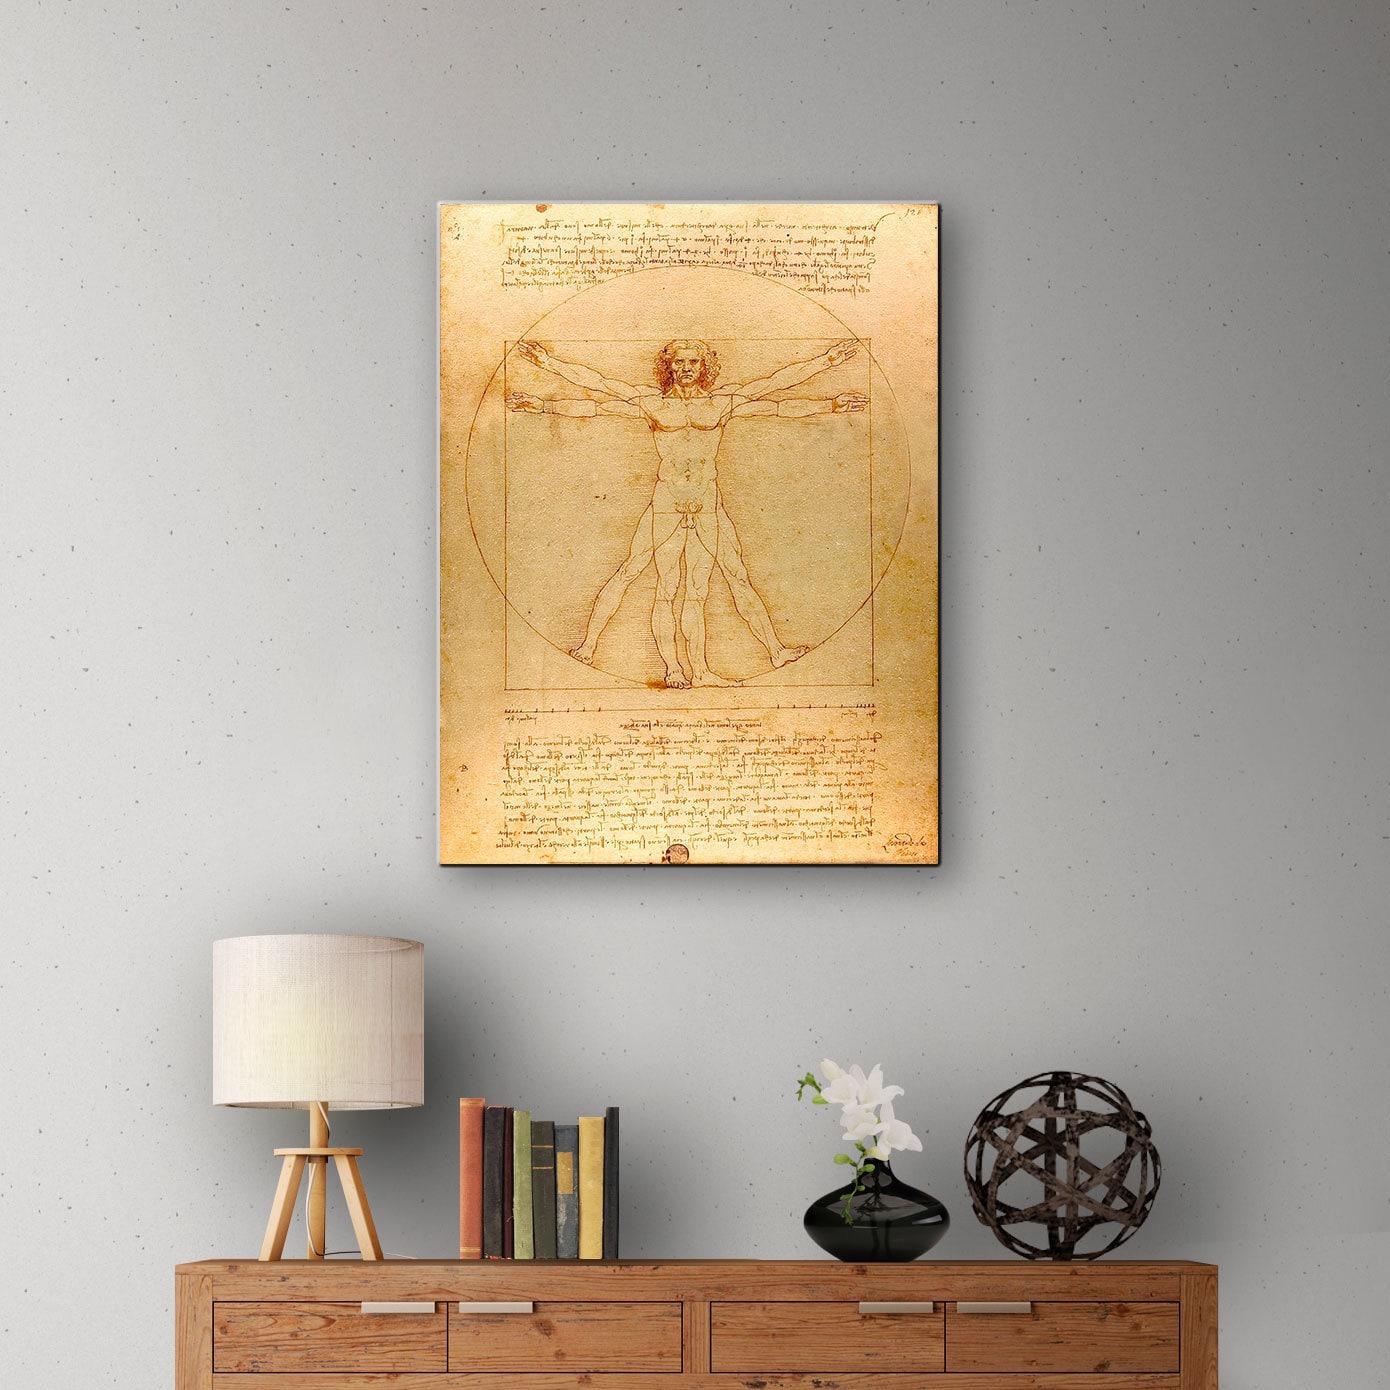 Art Wall \'\'vitruvian Man\'\' by Leonardo Da Vinci Painting Print on ...